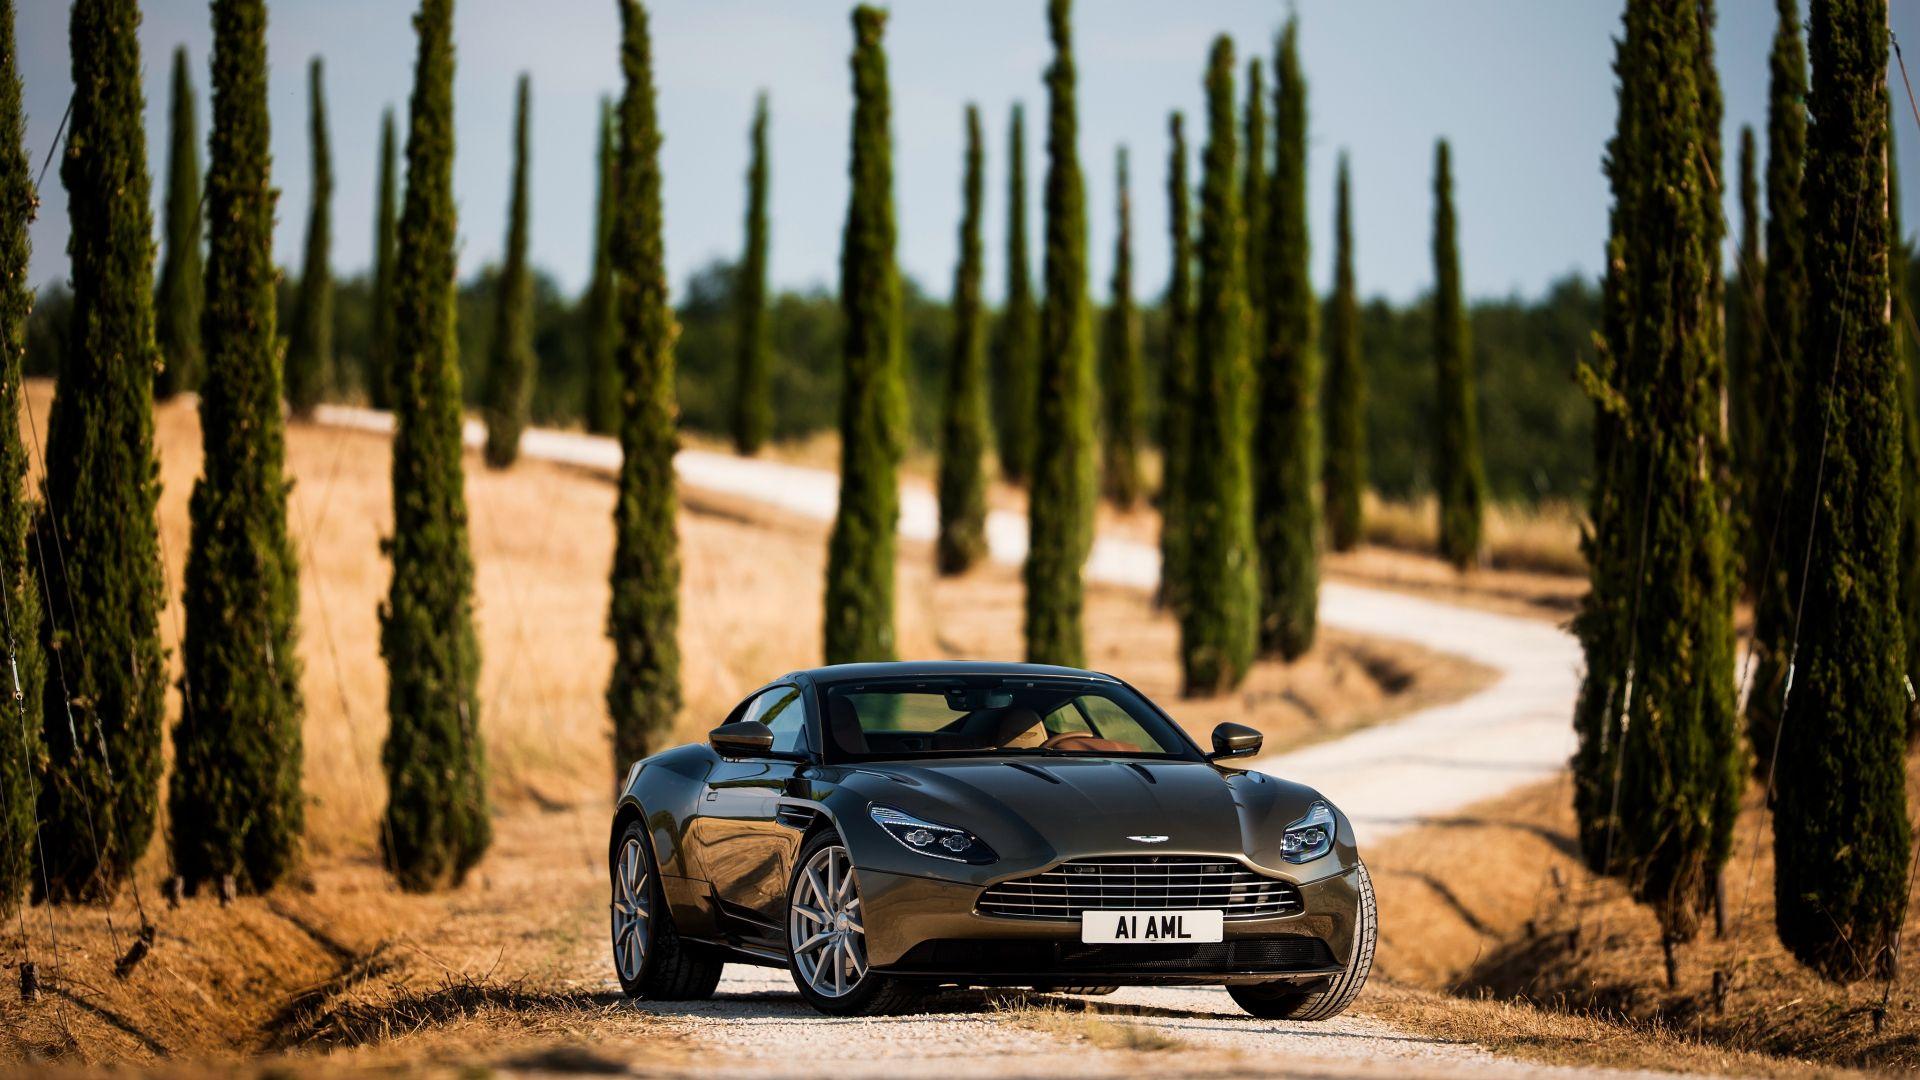 Wallpaper Aston martin DB1 car